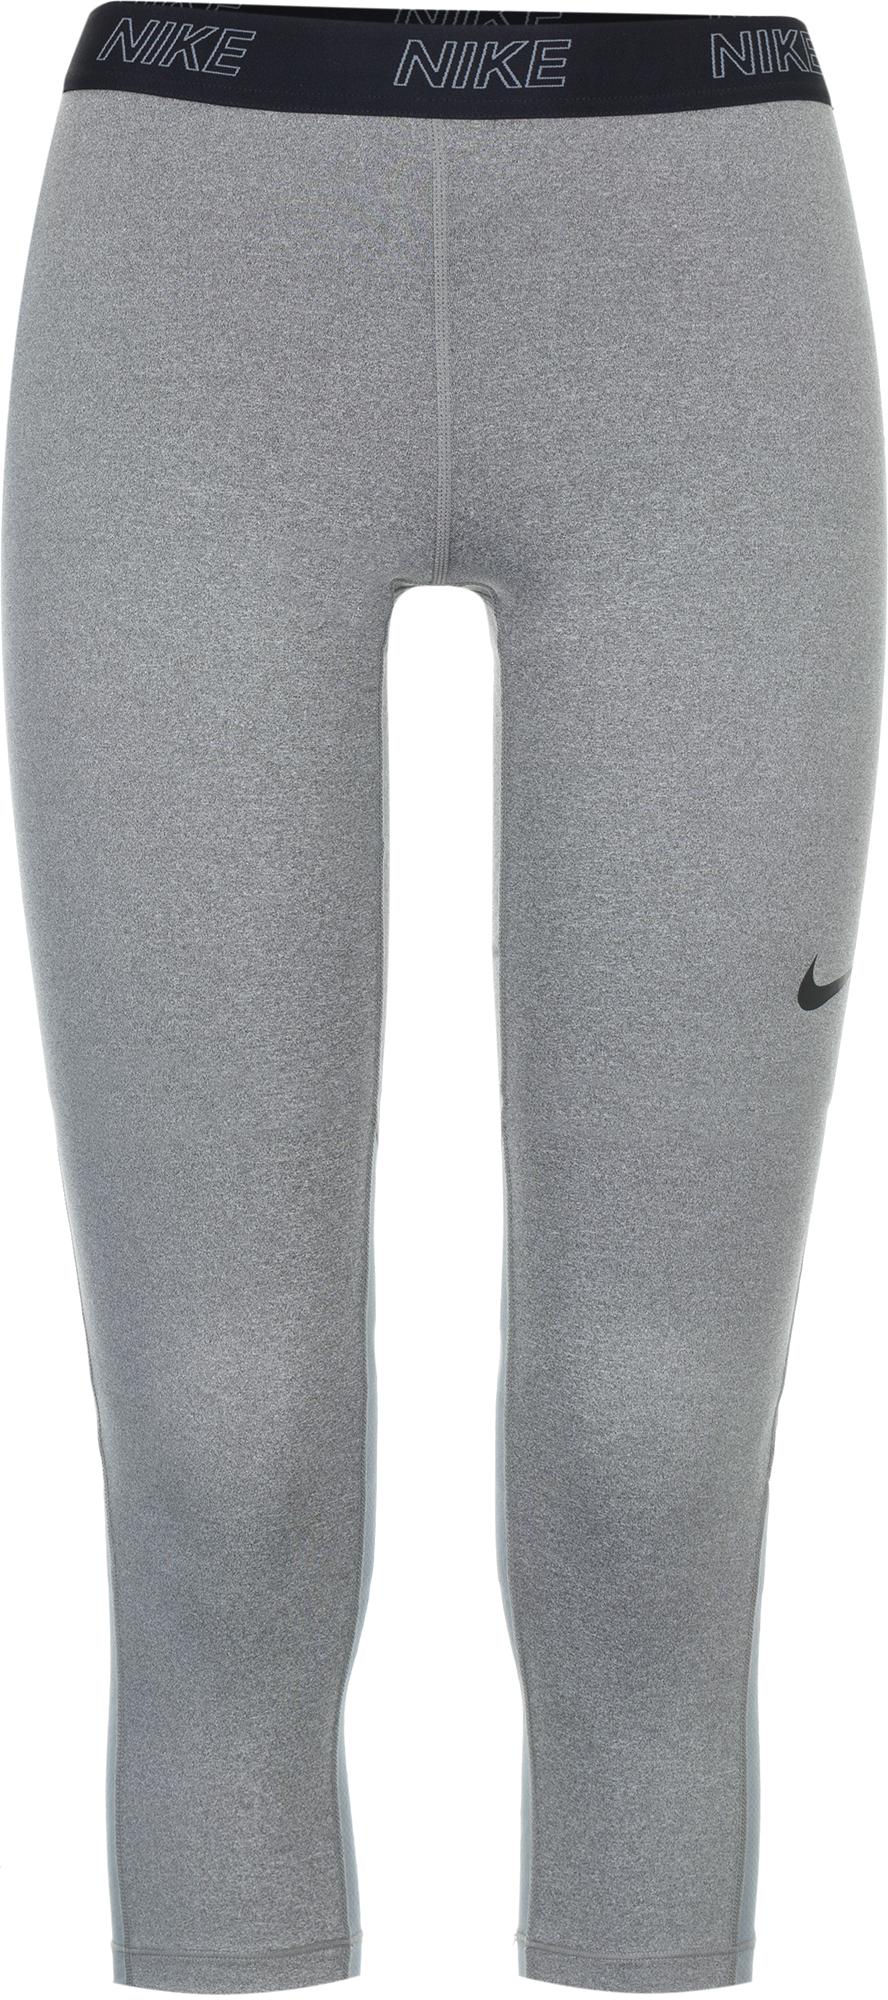 Nike Бриджи женские Nike Victory бриджи